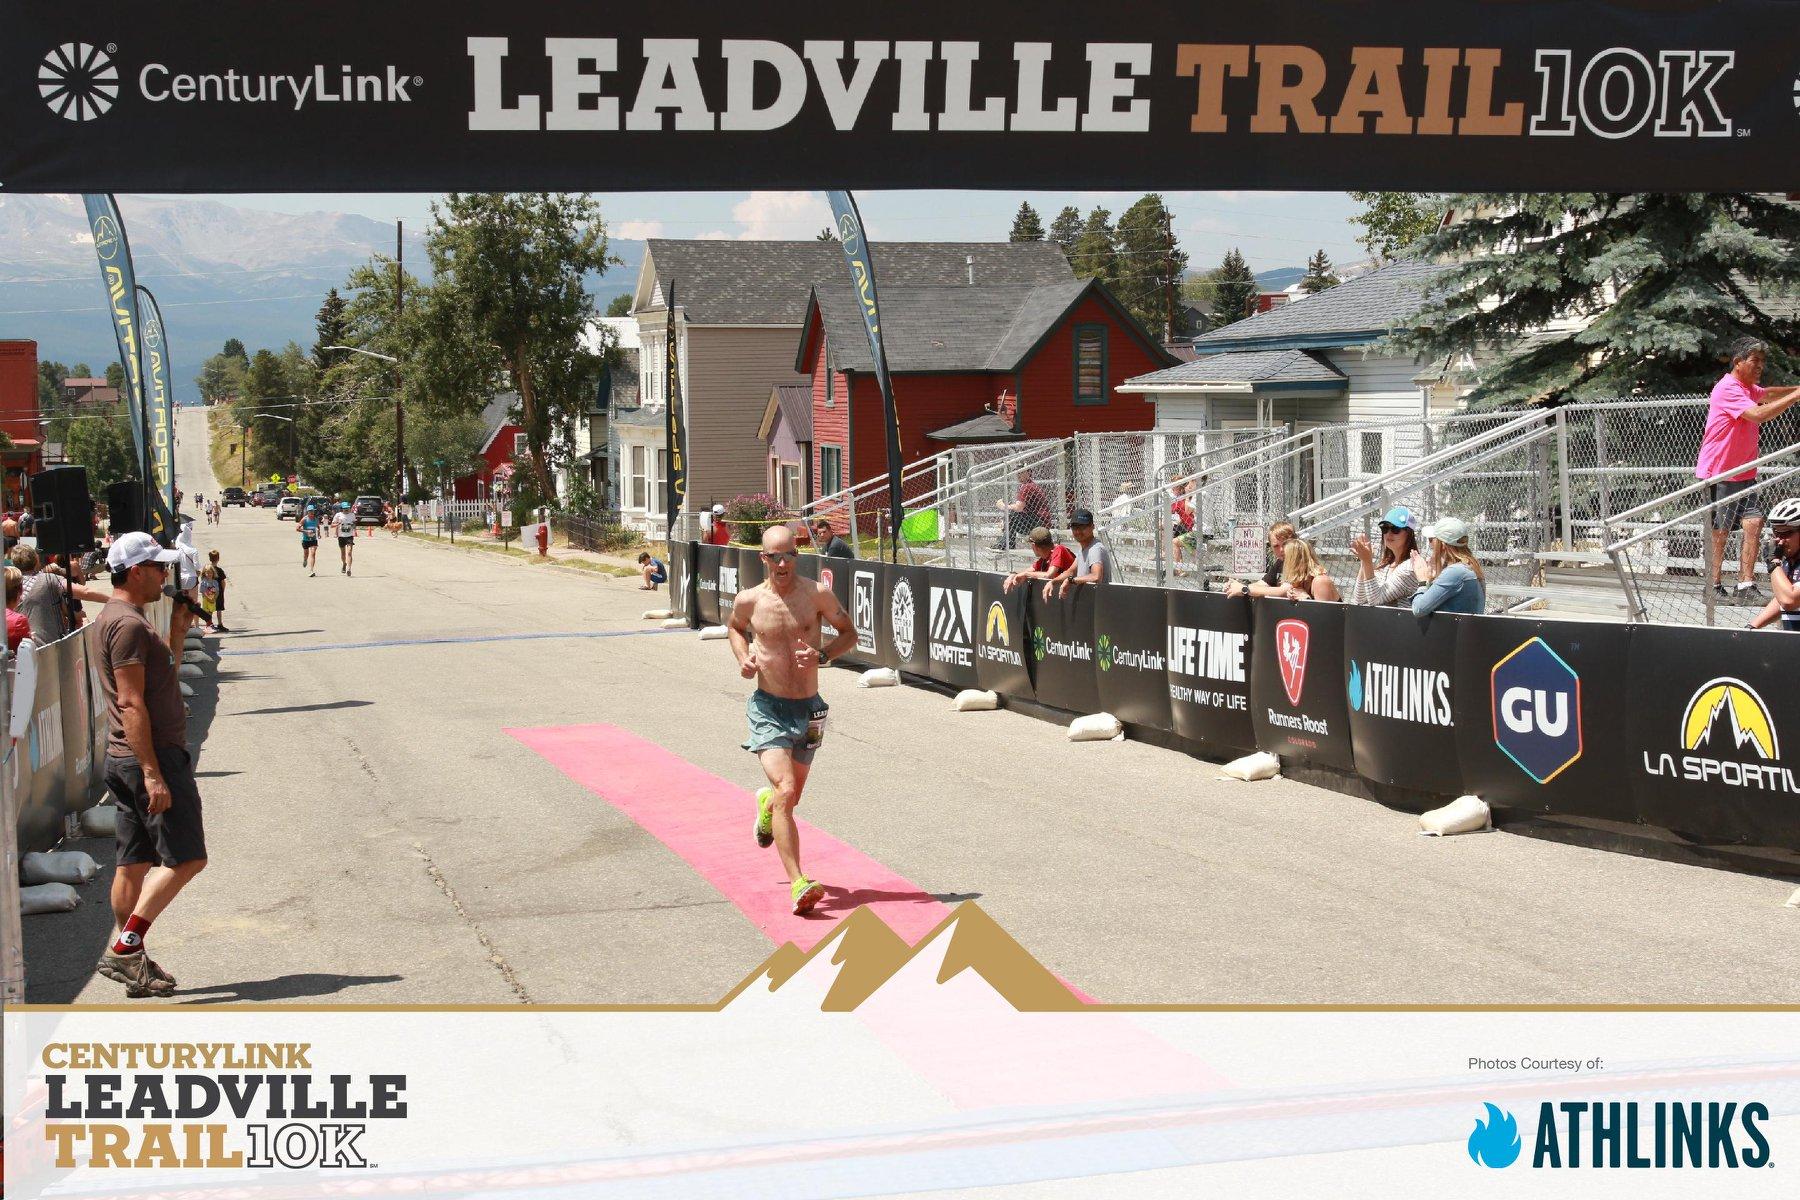 Coach_Terry_Wilson_Pursuit_of_The_Perfect_Race_Leadville_100_Big_Sexy_Racing_Chris_Whelchel_Finish_Leadman_10K.jpg